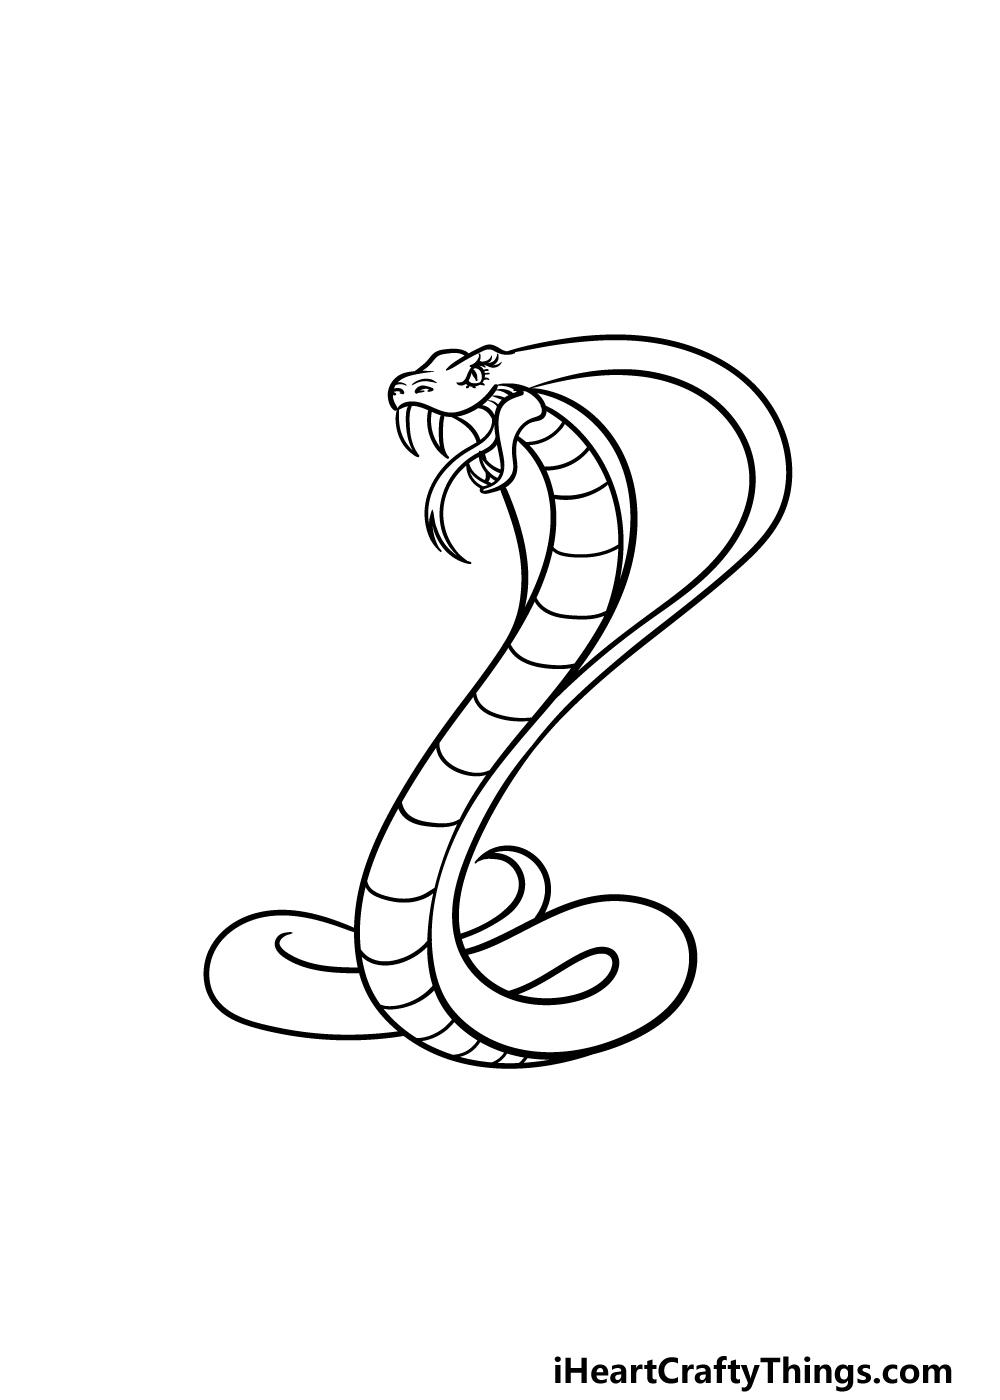 drawing cobra step 3